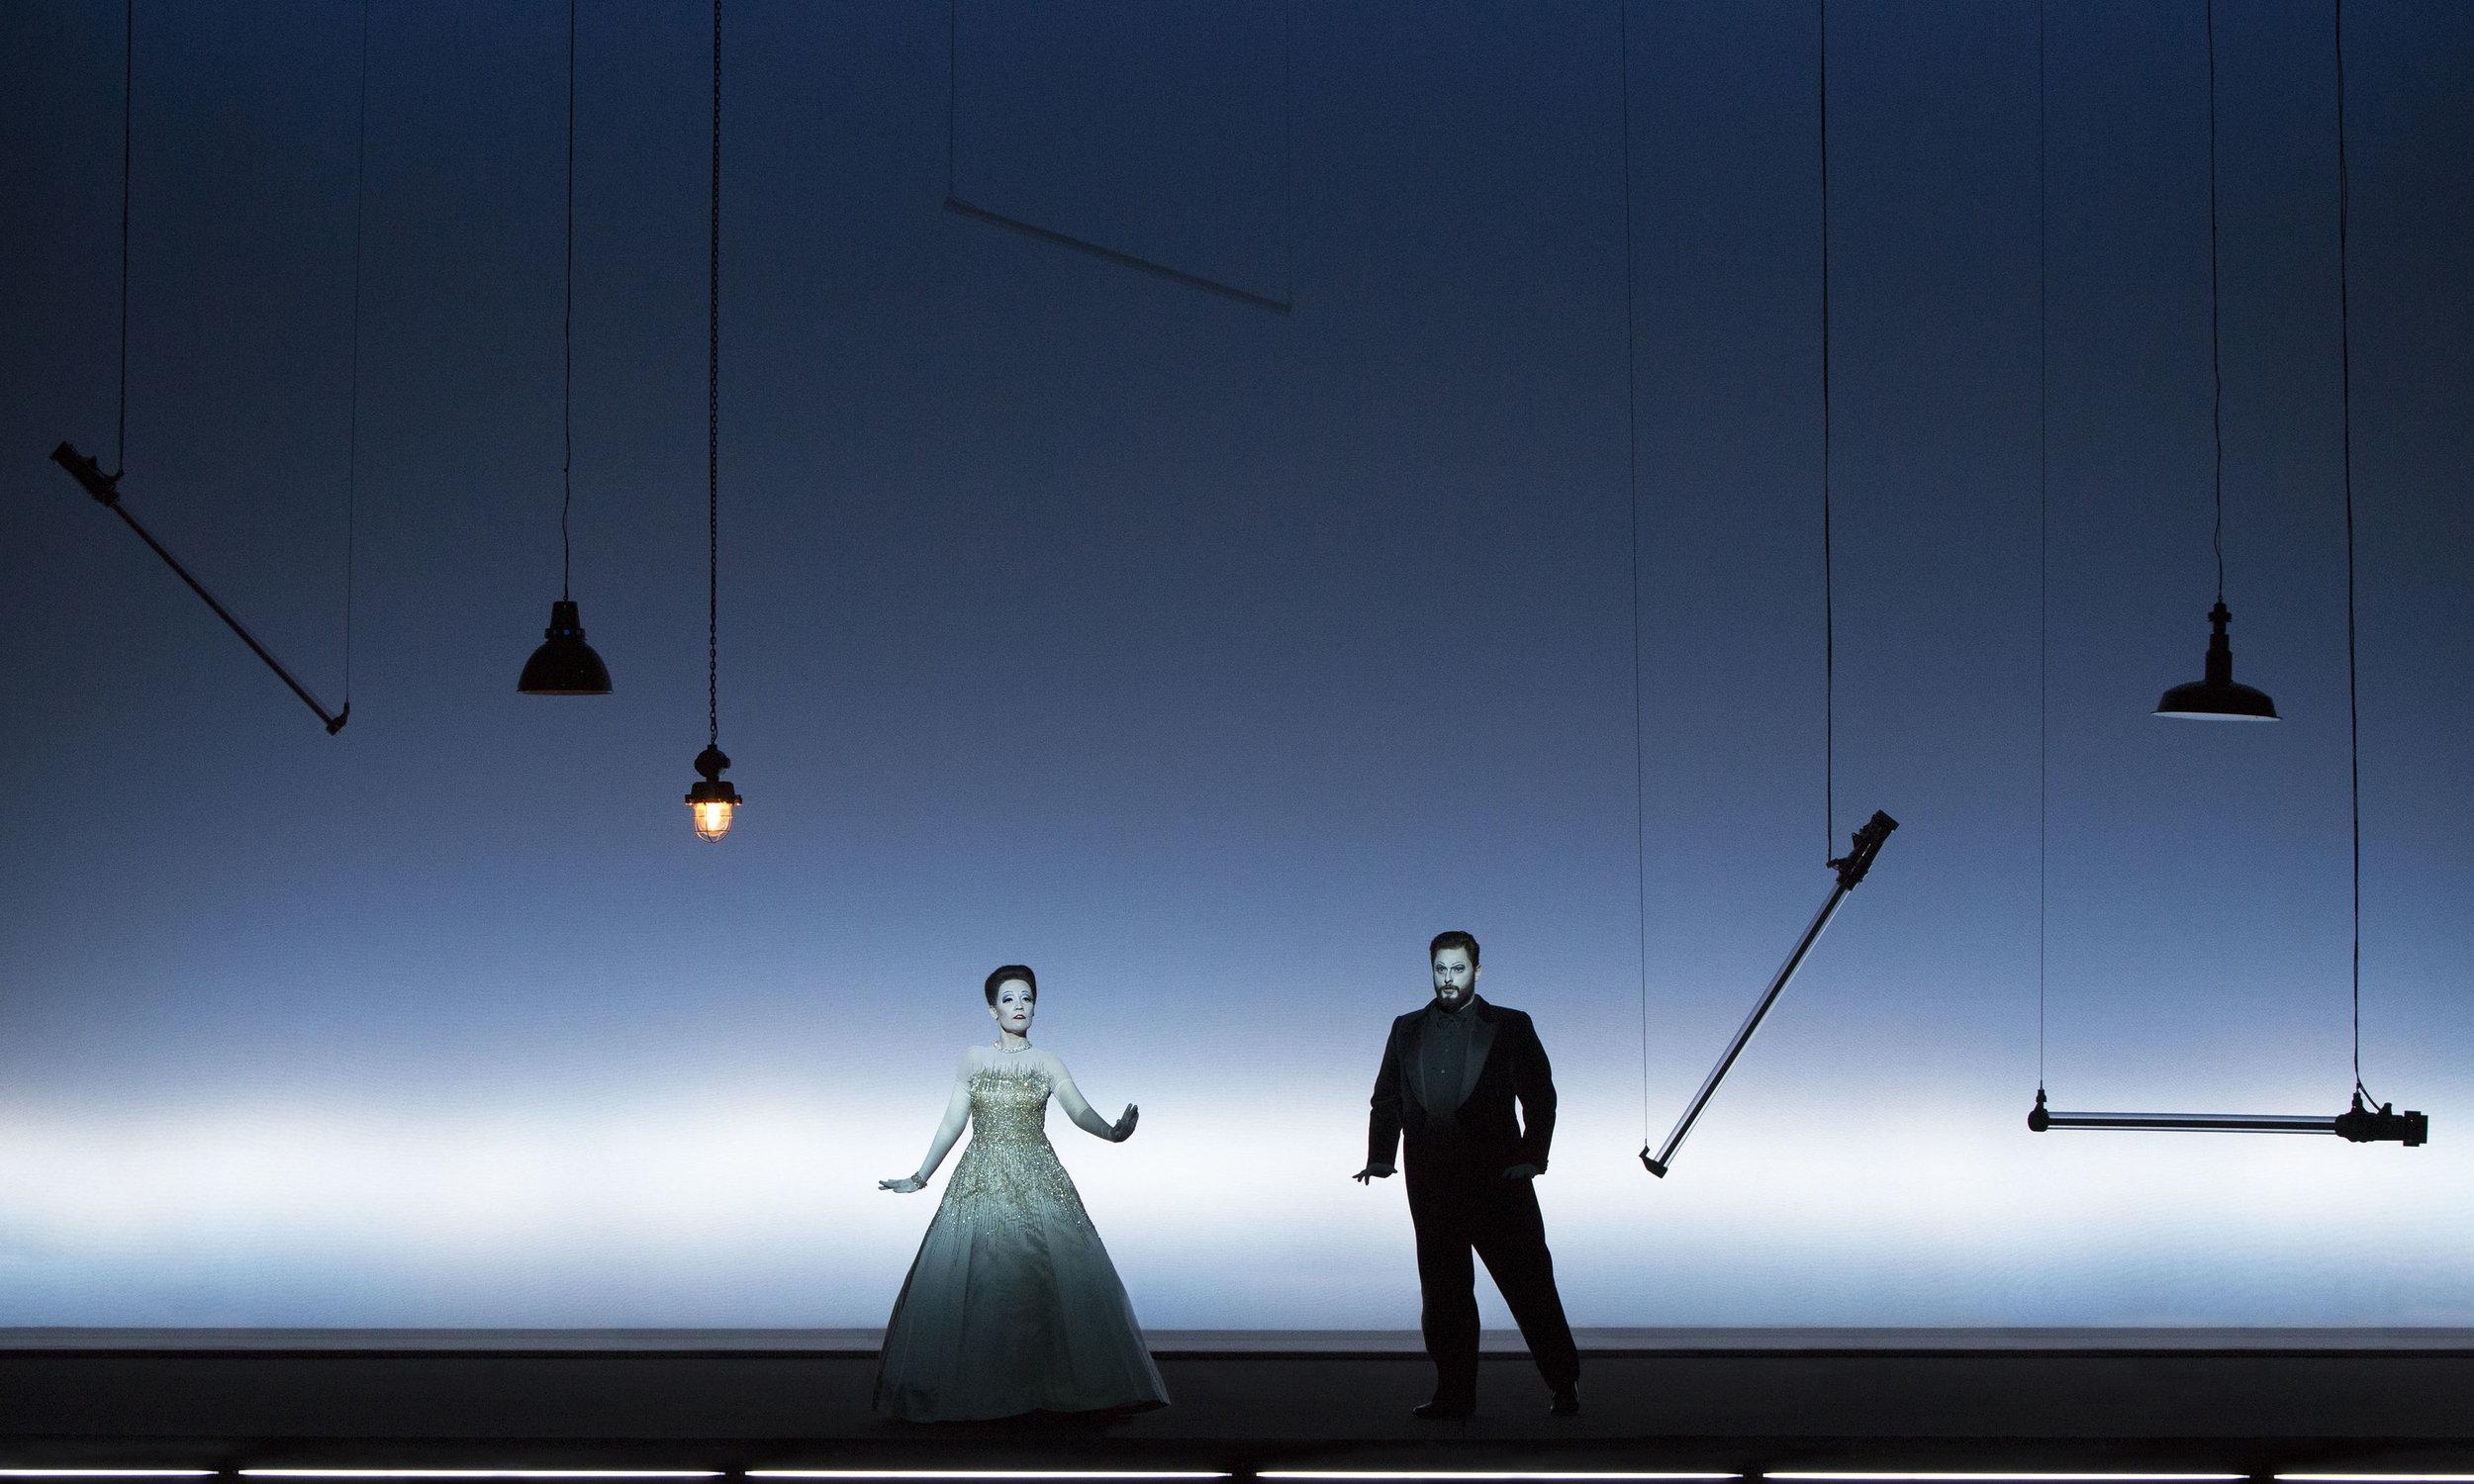 Act II, Scene 2: Rebecca Nelsen (Violetta), Airam Hernandez (Alfredo). Perm, 2016